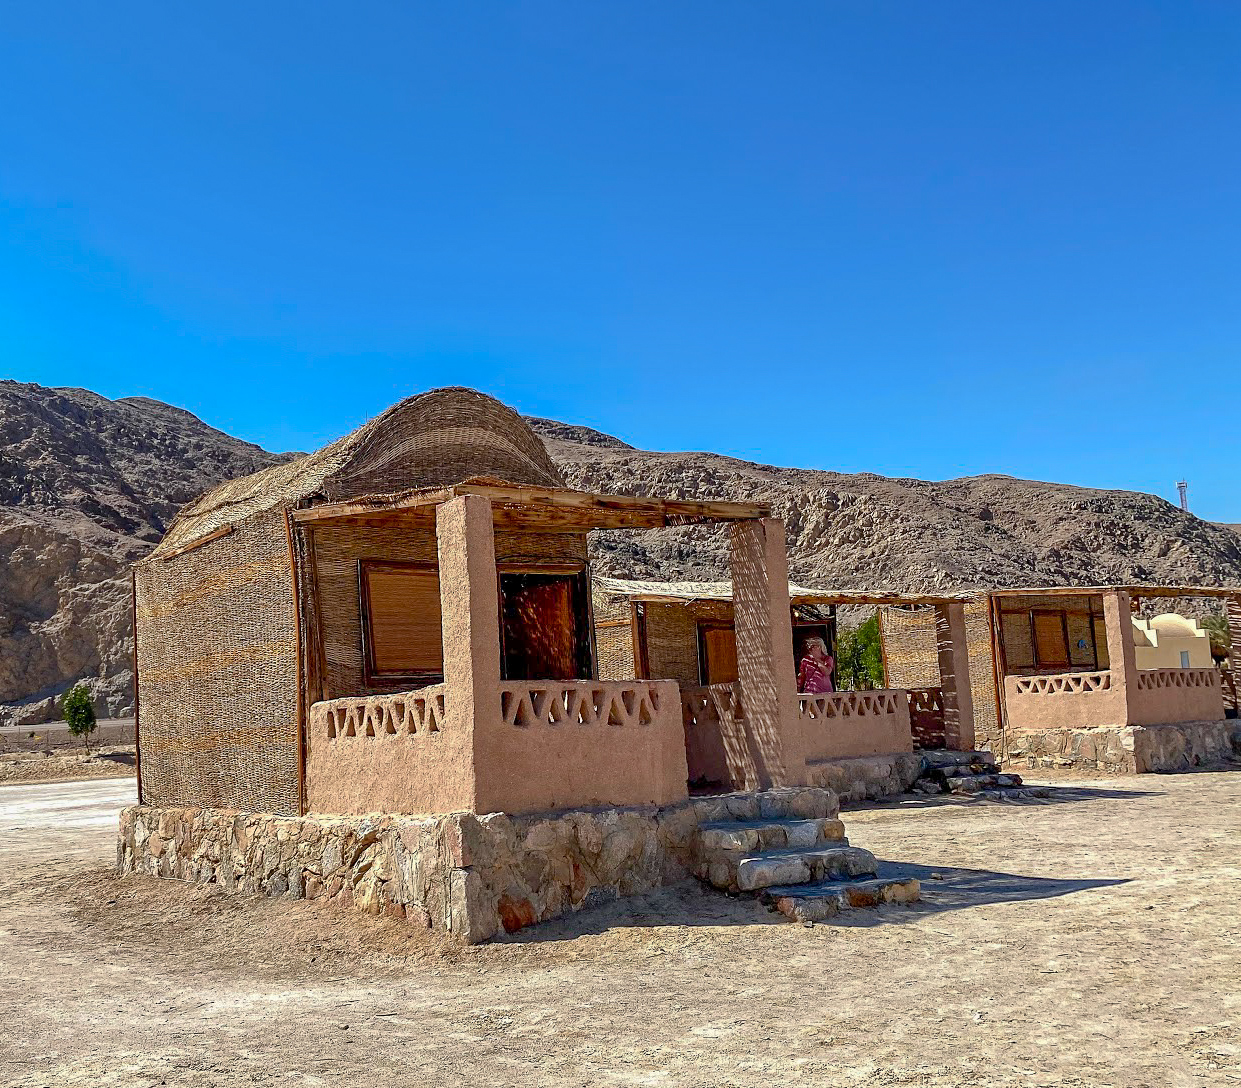 Husha hut on the beach at Aqua Sun, Gulf of Aqaba, Egypt